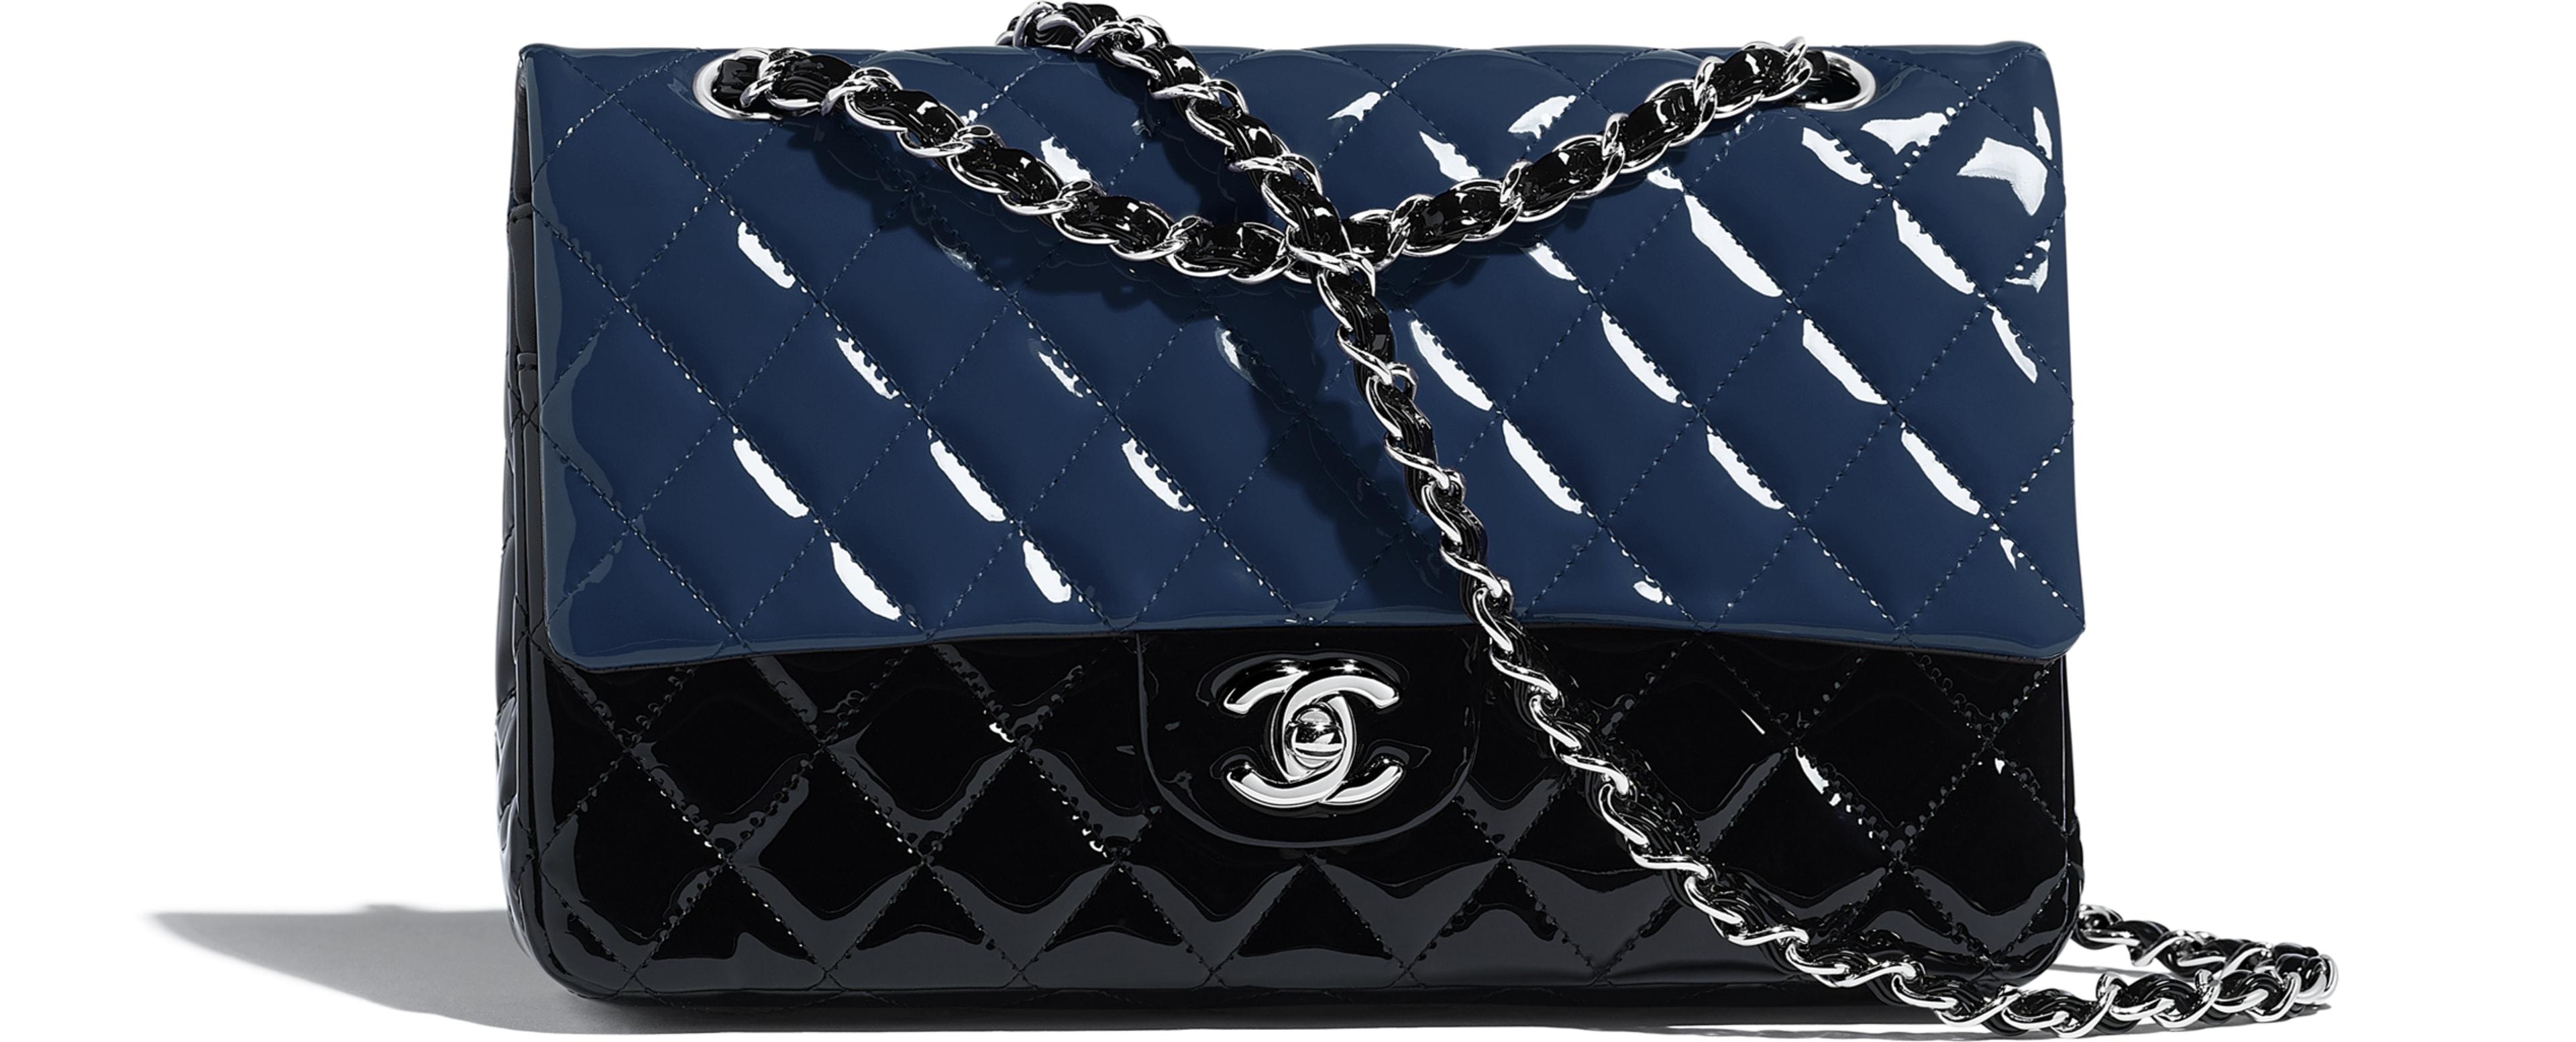 Patent Calfskin Navy Blue & Black